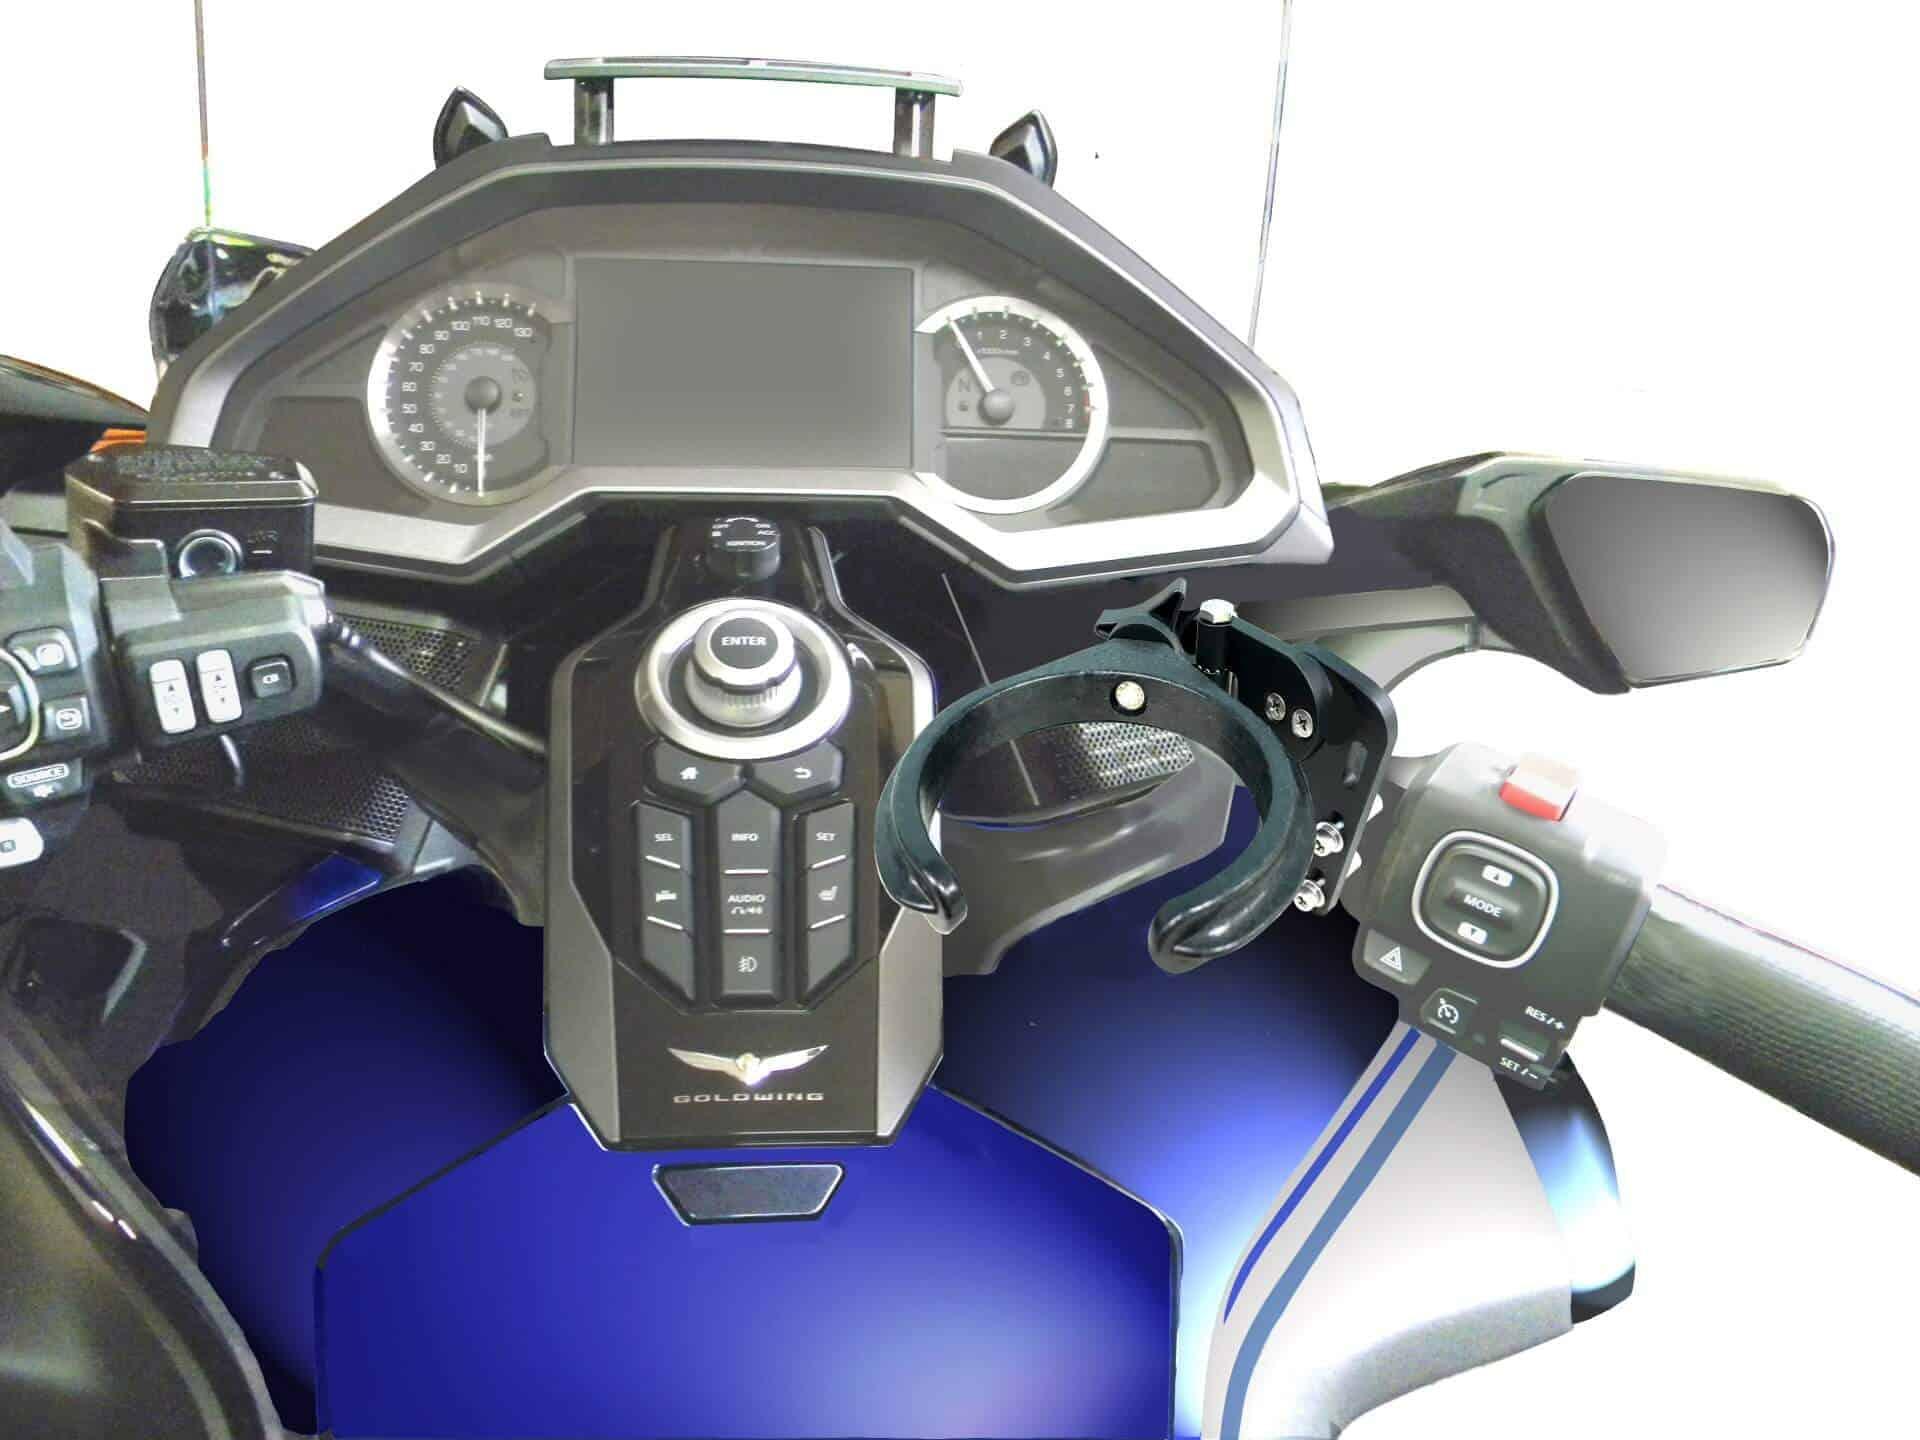 GRAPHITE DESIGN  Motorcycle Cup Drink Holder Bike ATV Handlebar Mount